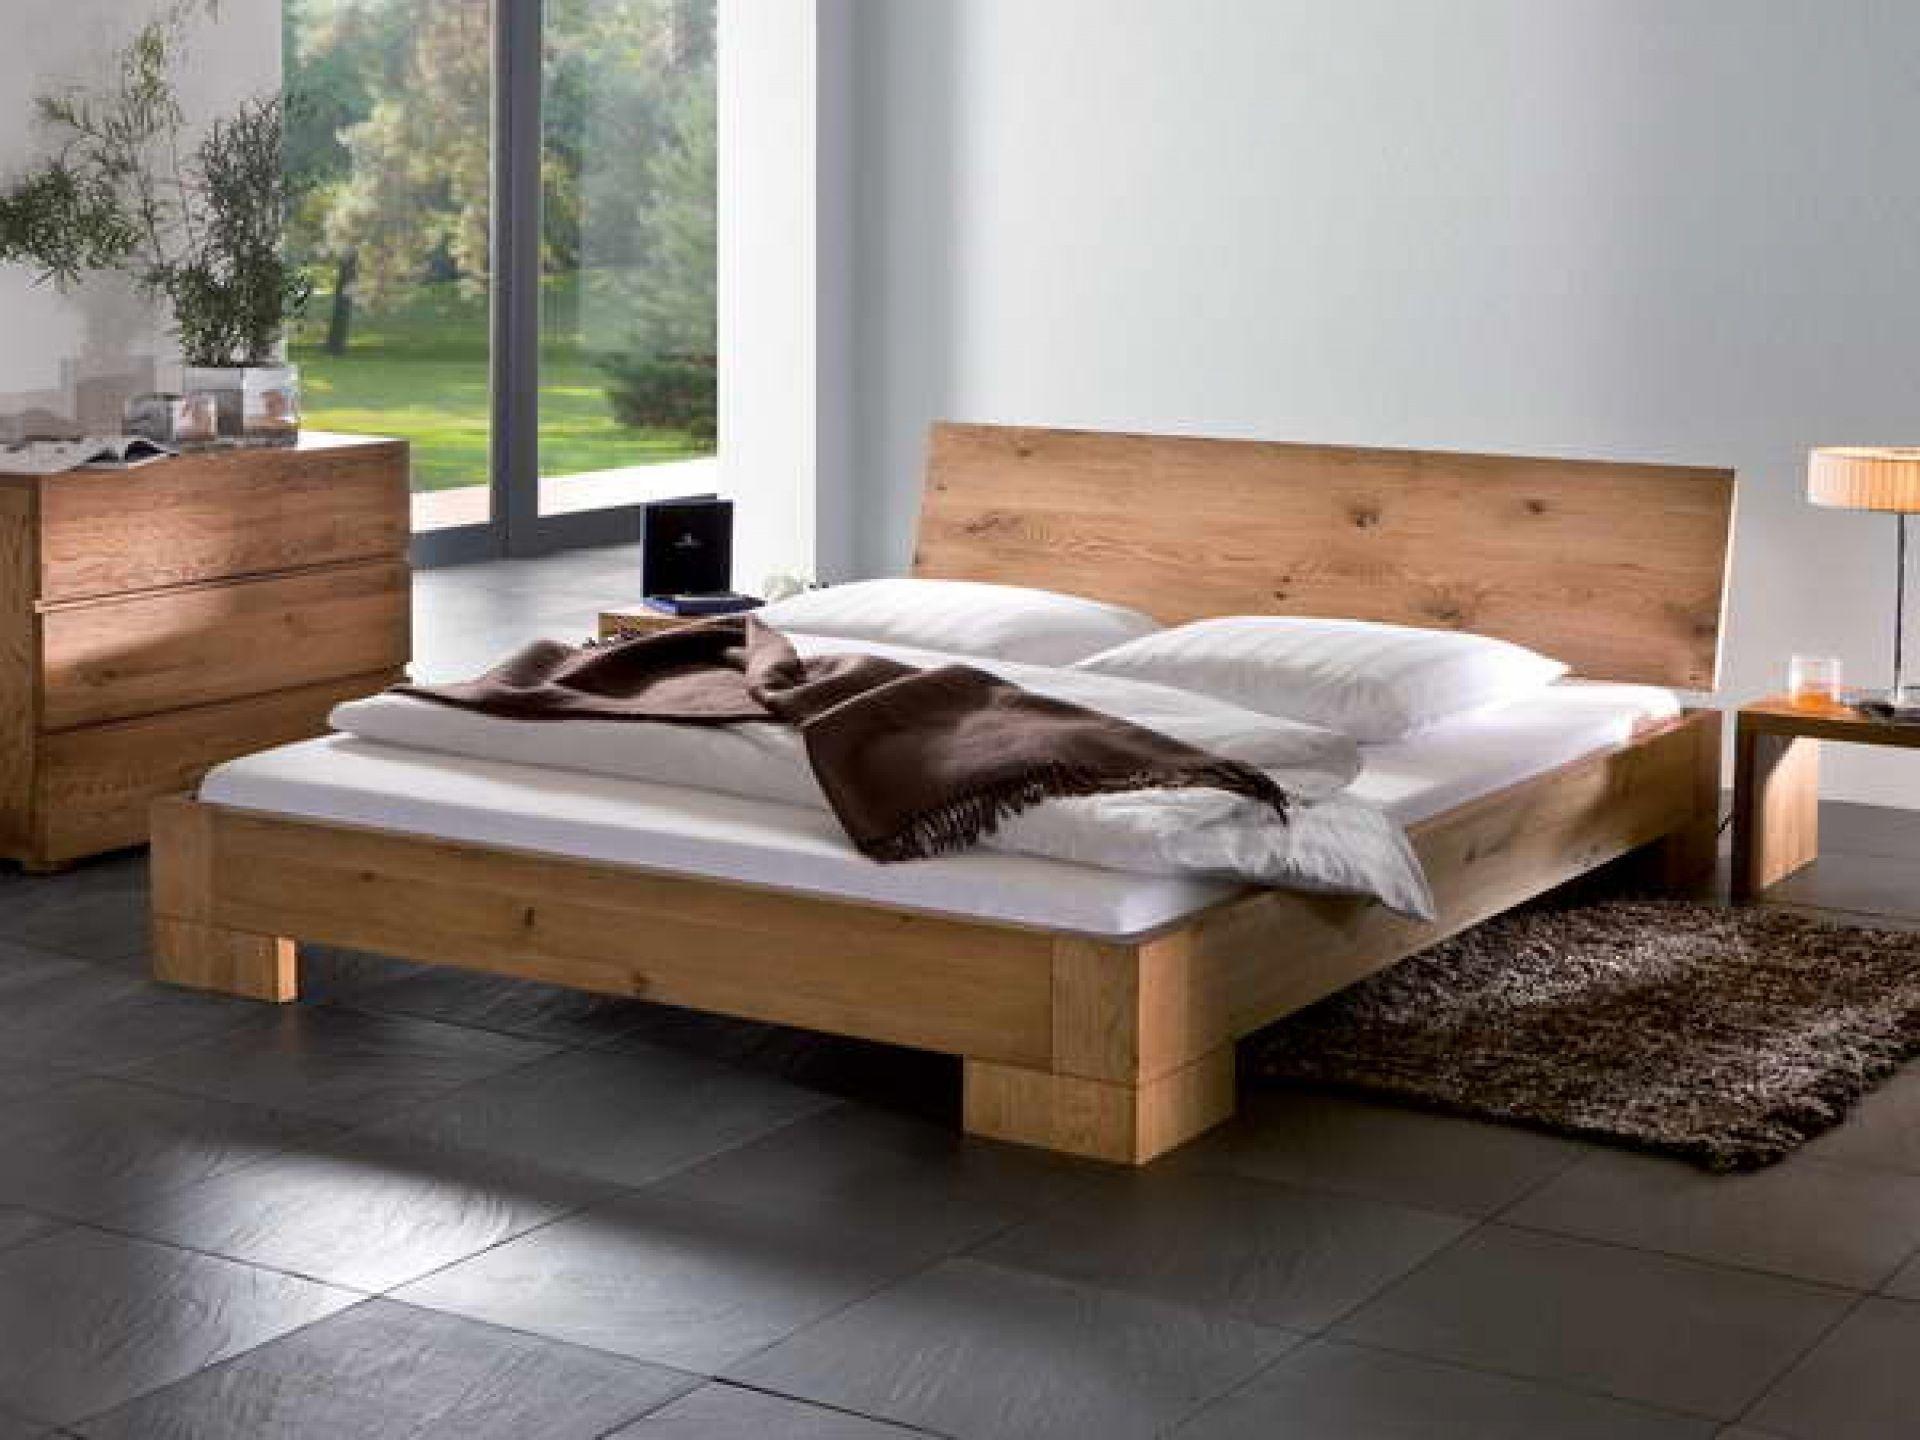 Homemade bed frames - Fascinating Homemade Bed Frame